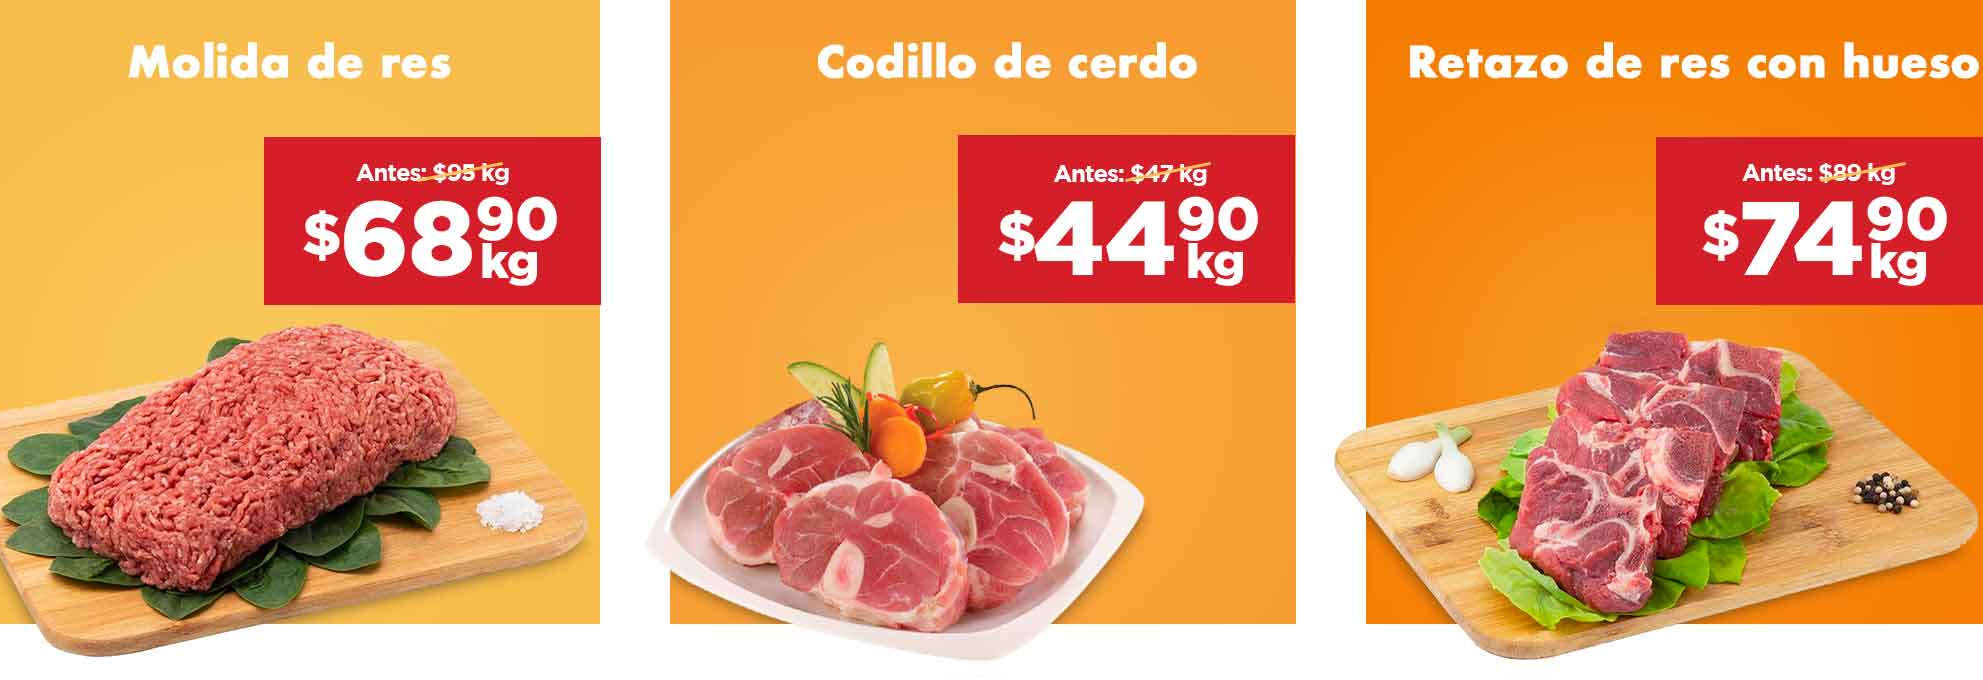 Ofertas Chedraui Martimiércoles de carnes 30 de Septiembre 2020